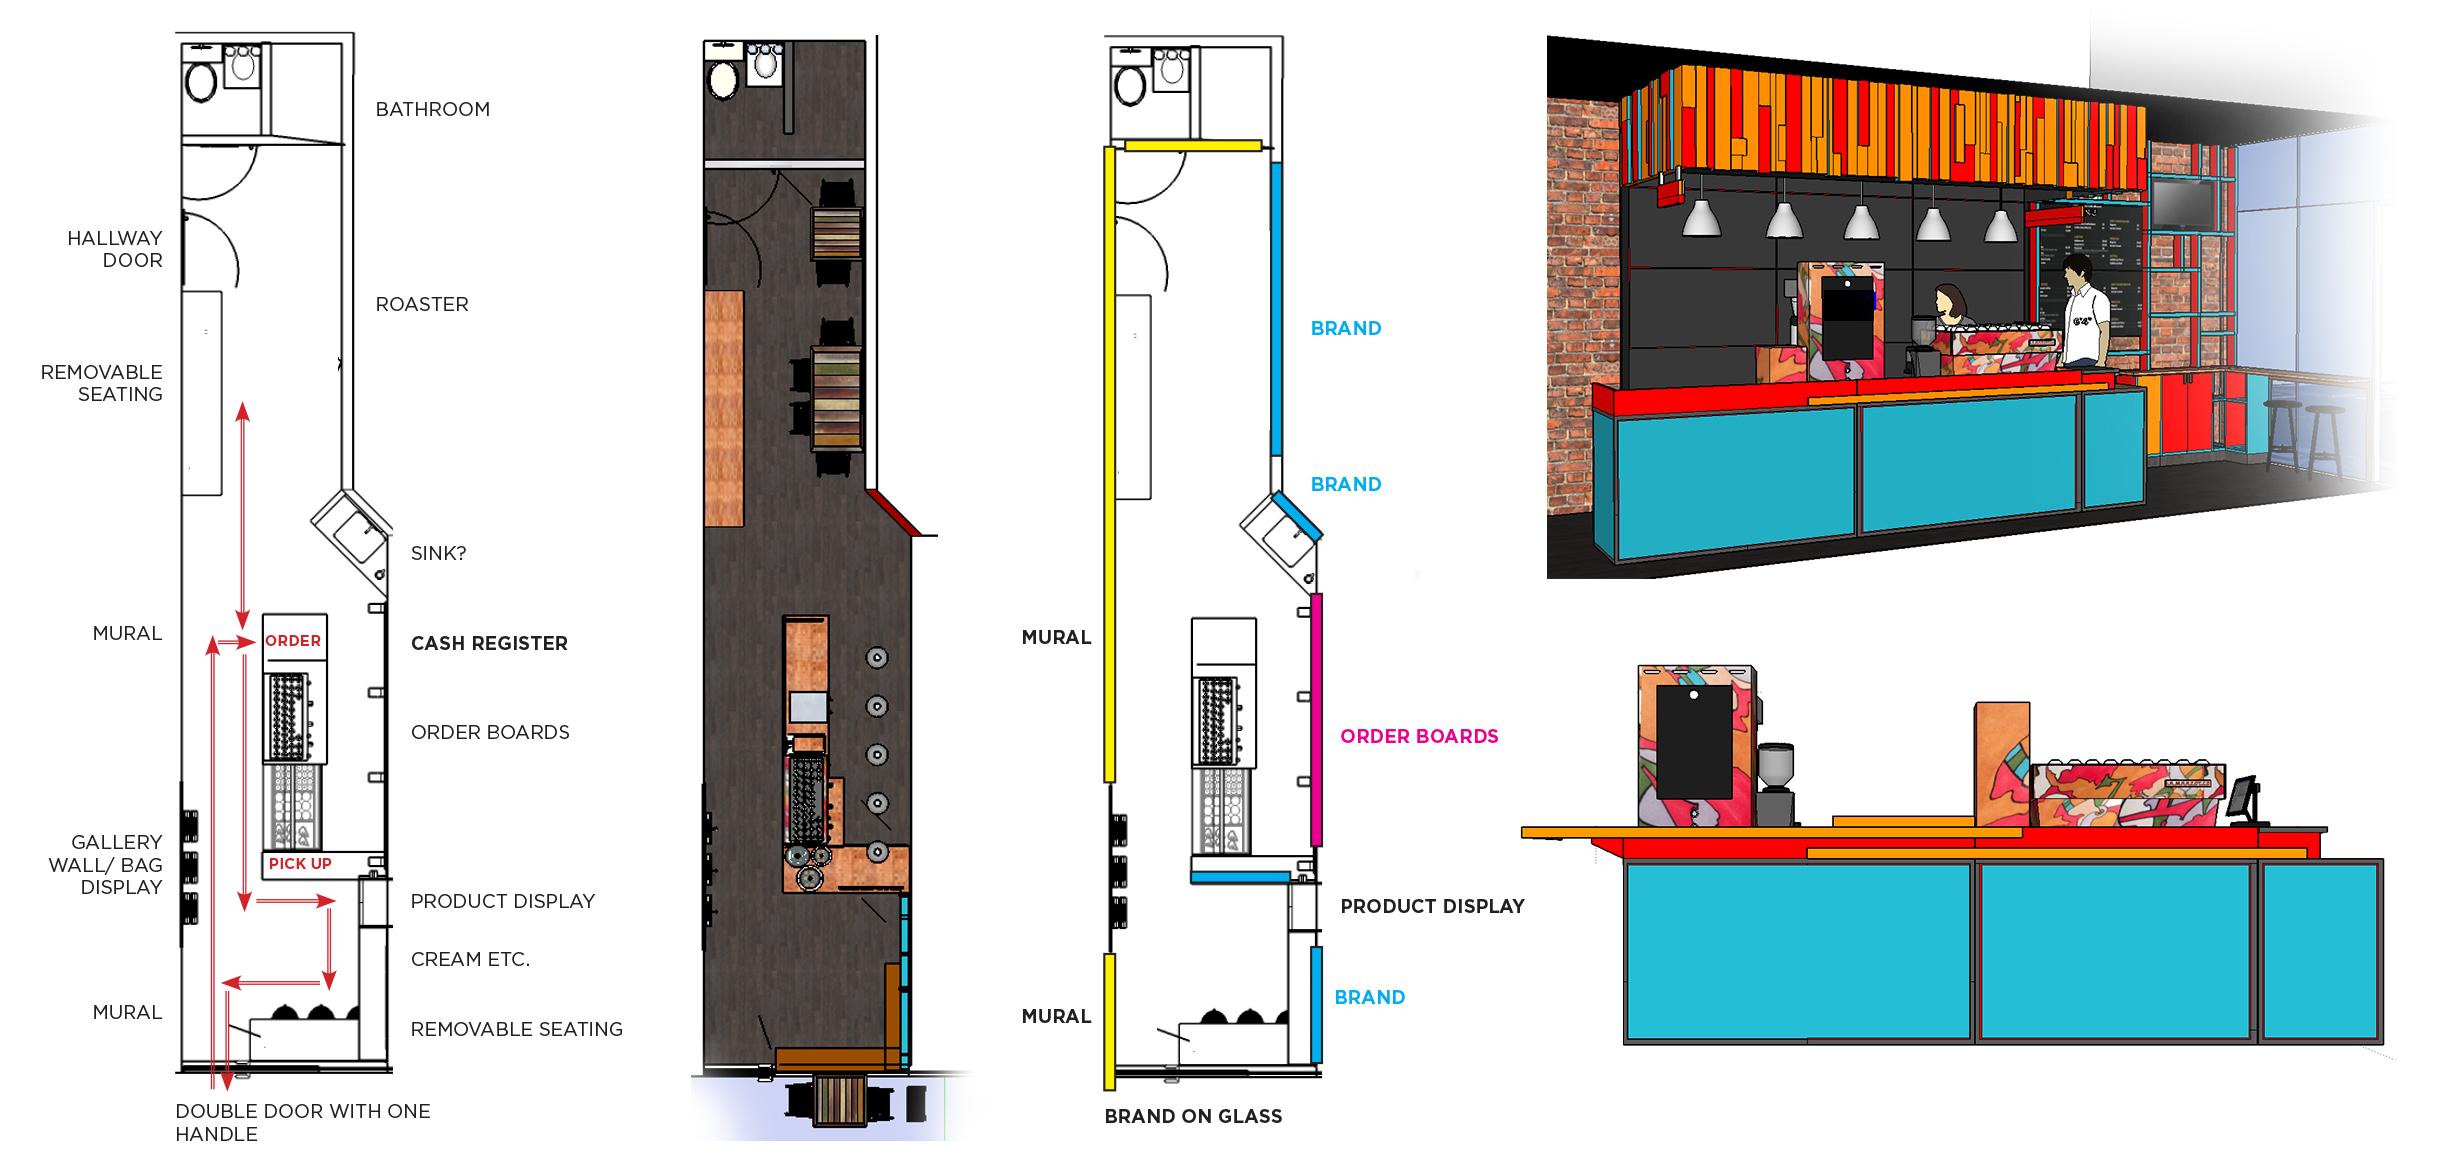 Master planning and design developments